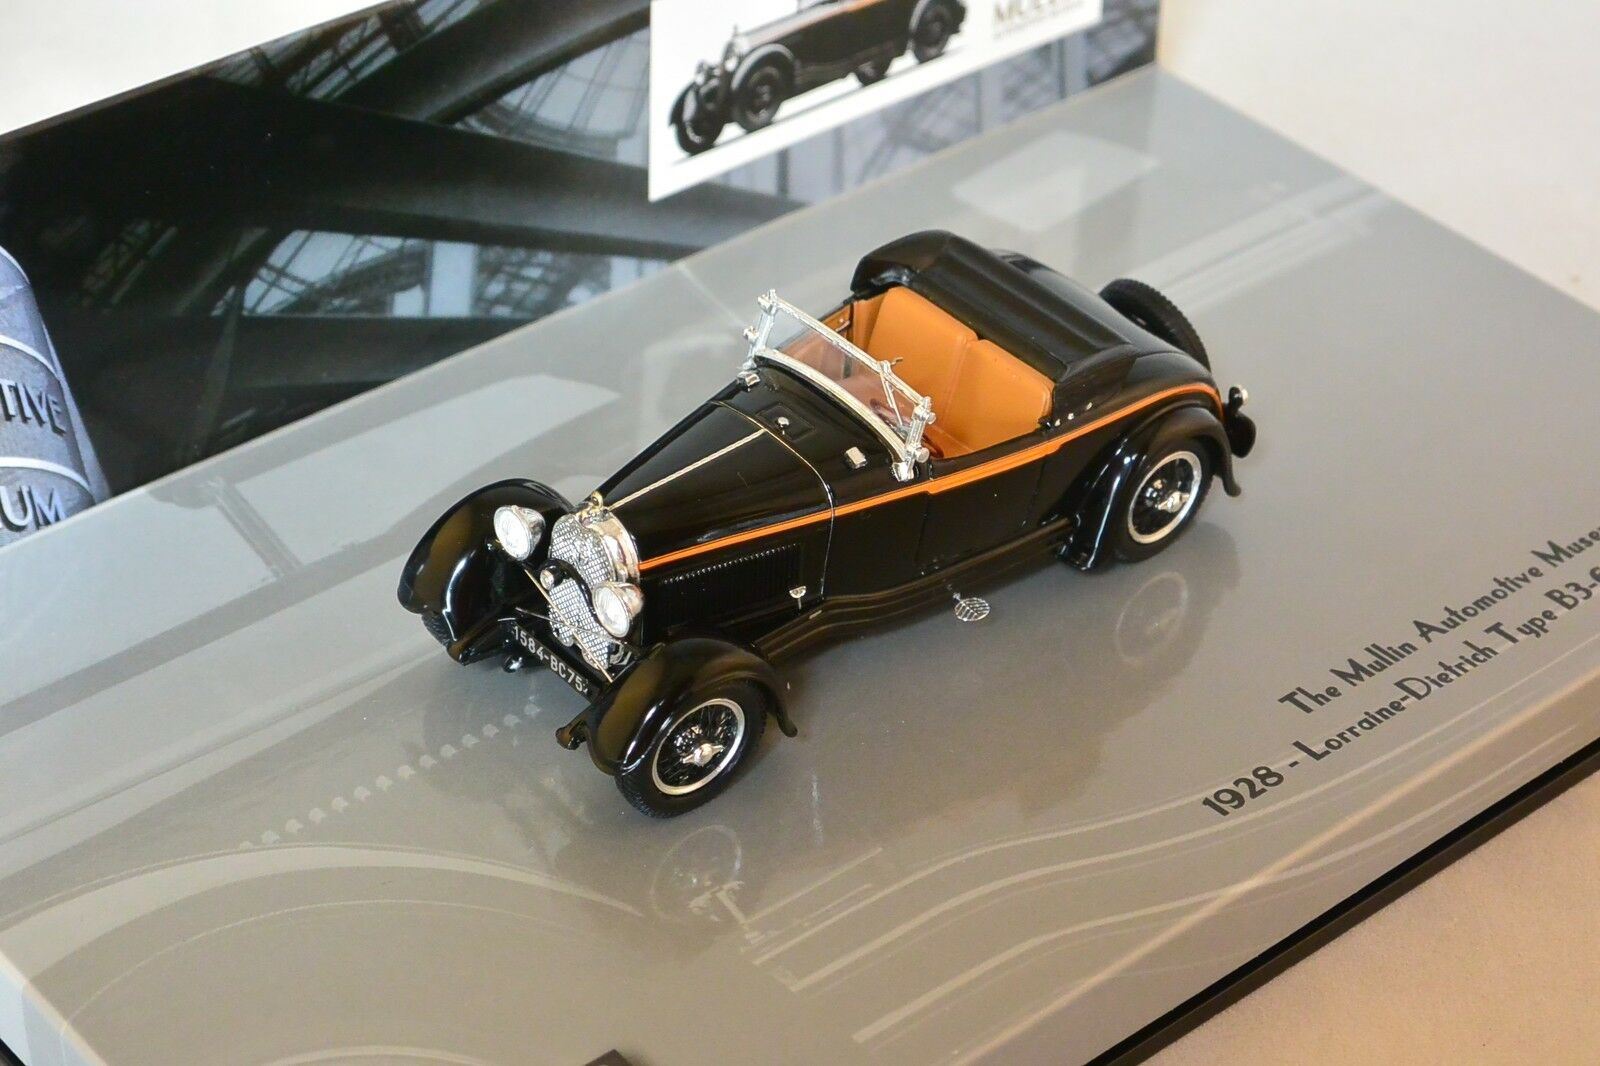 MINICHAMPS 437119260 - Lorraine Dietrich B3-6 Sports Roadster 1928